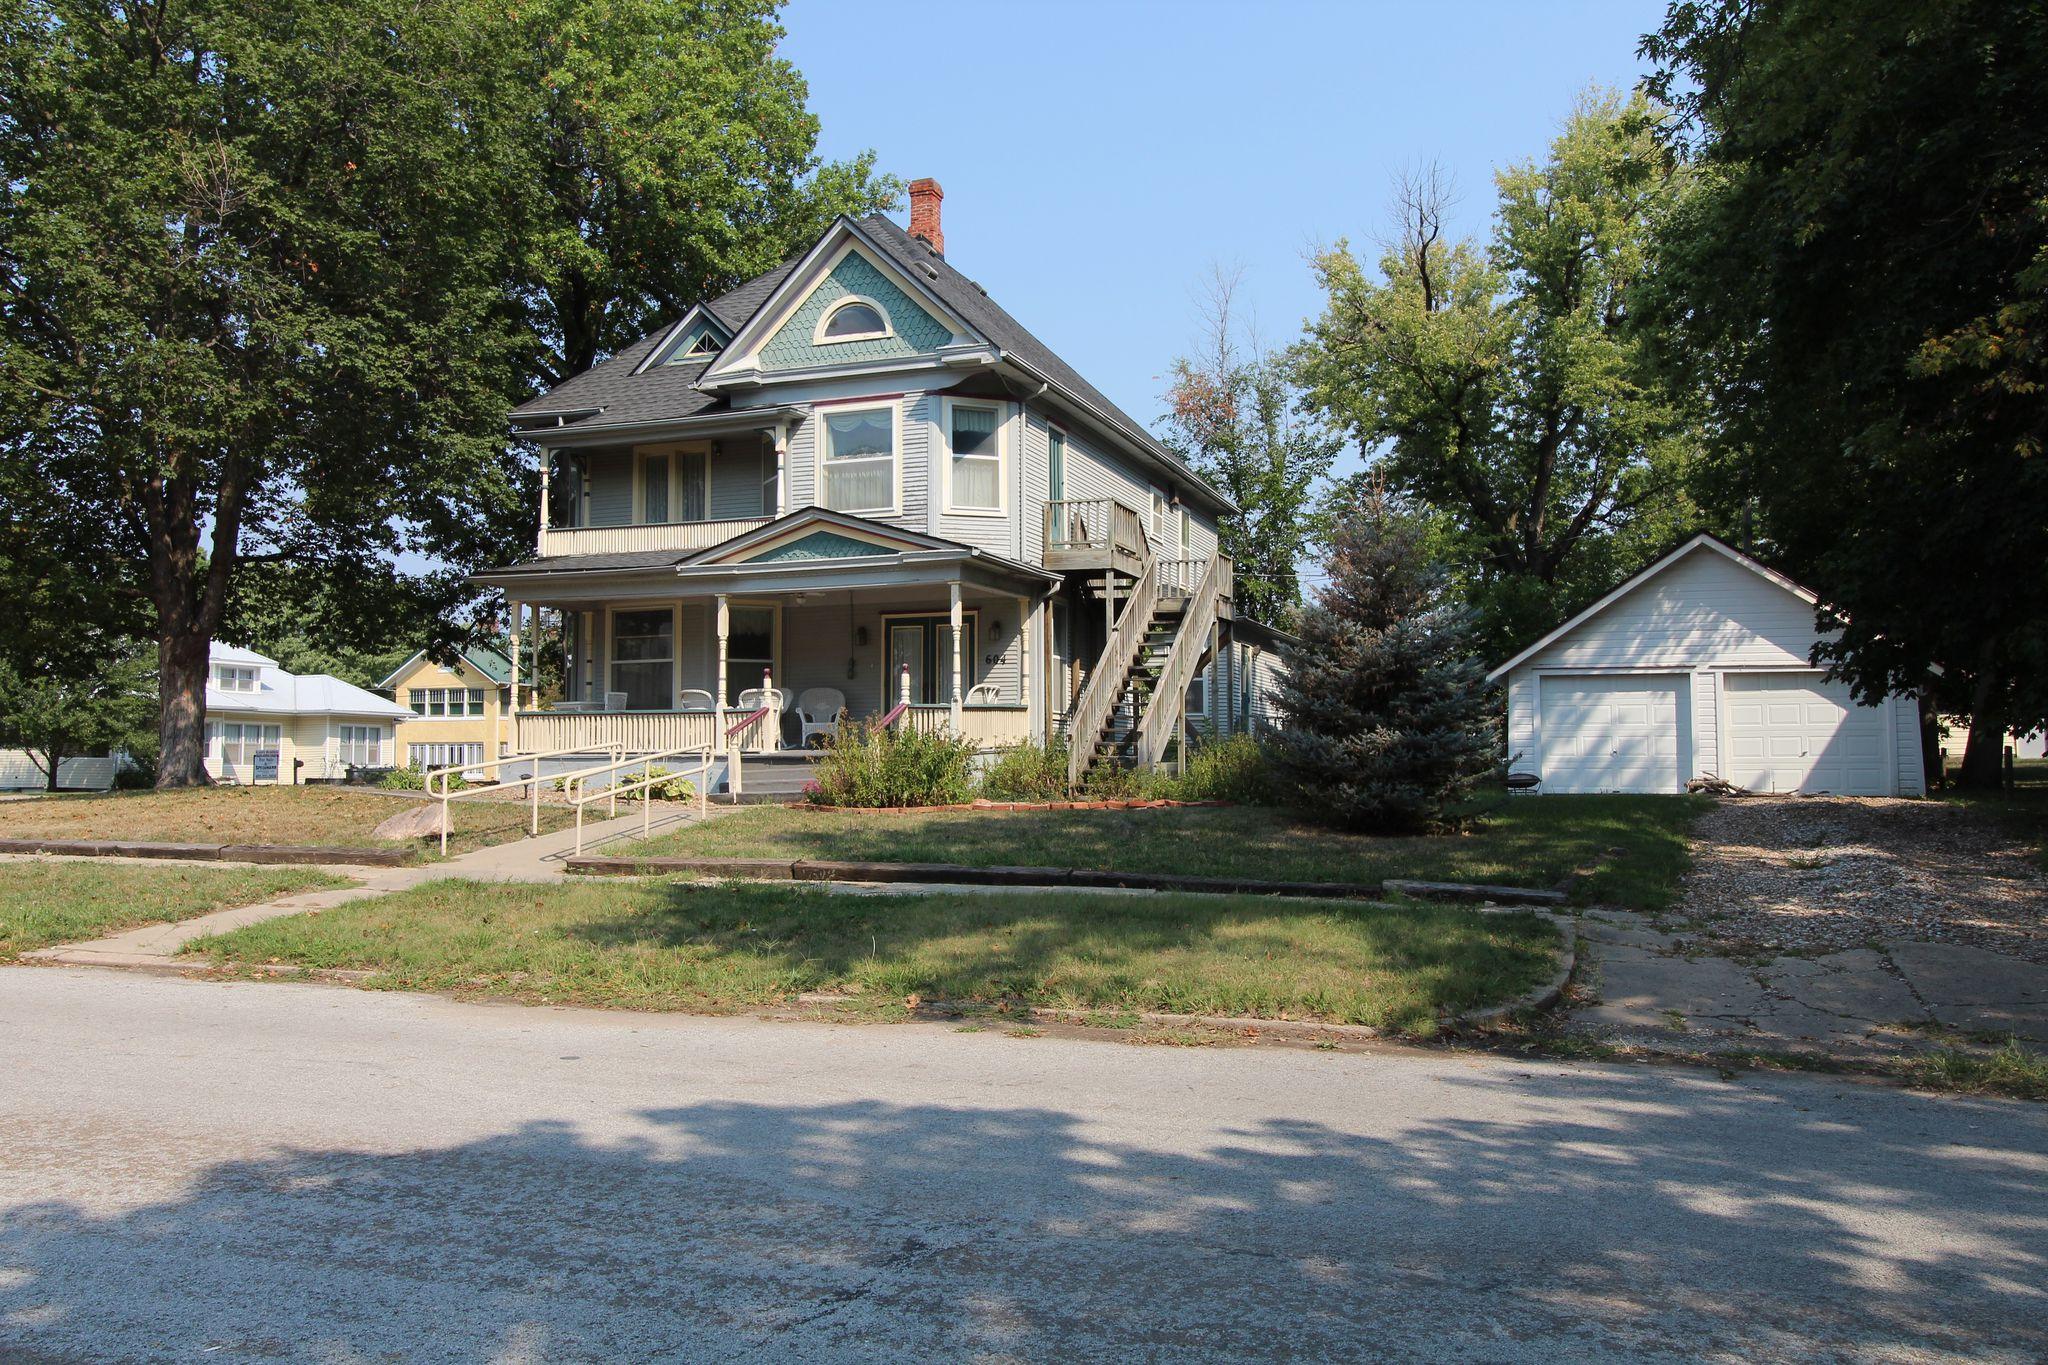 Pawnee City Nebraska >> 604 9th St Pawnee City Ne 68420 5 Bed 2 Bath Single Family Home